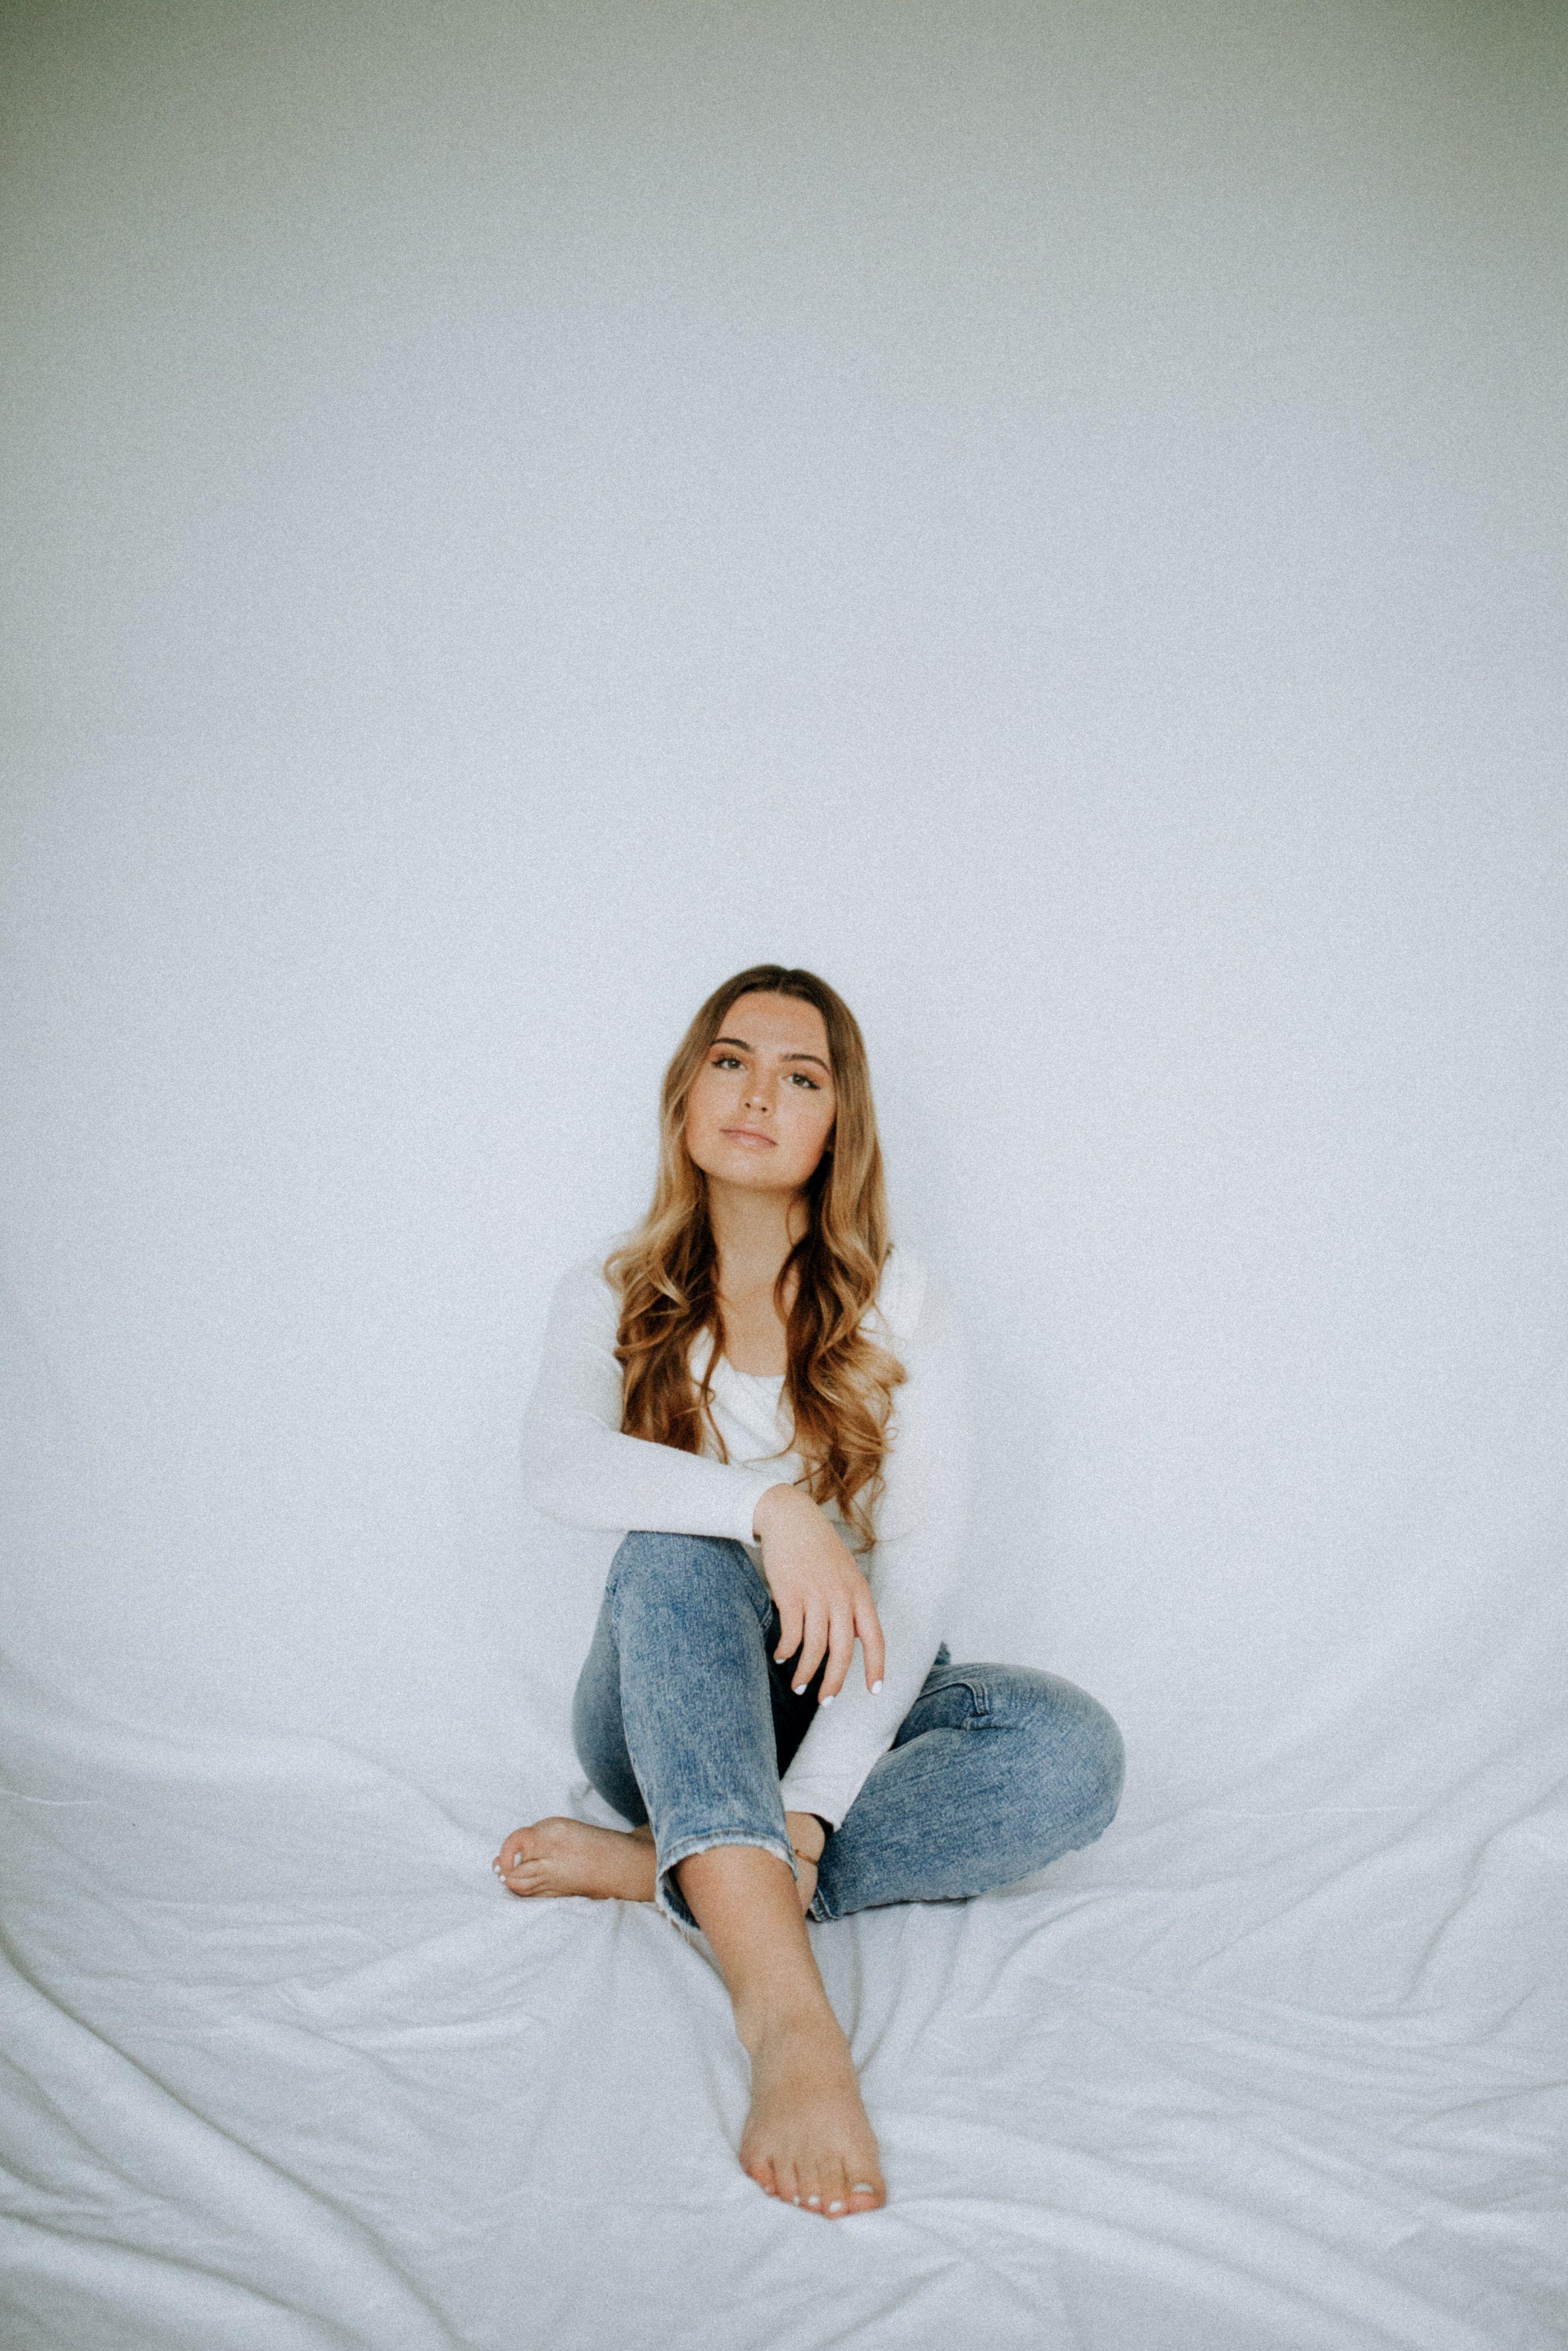 #studiophotography #girlstudiophotography #naturallightportrait #naturallightstudio #seniorportraits #seniorphotography #seniorpictures #studiophotoshoot #photoshootoutfit #studiophotographytips